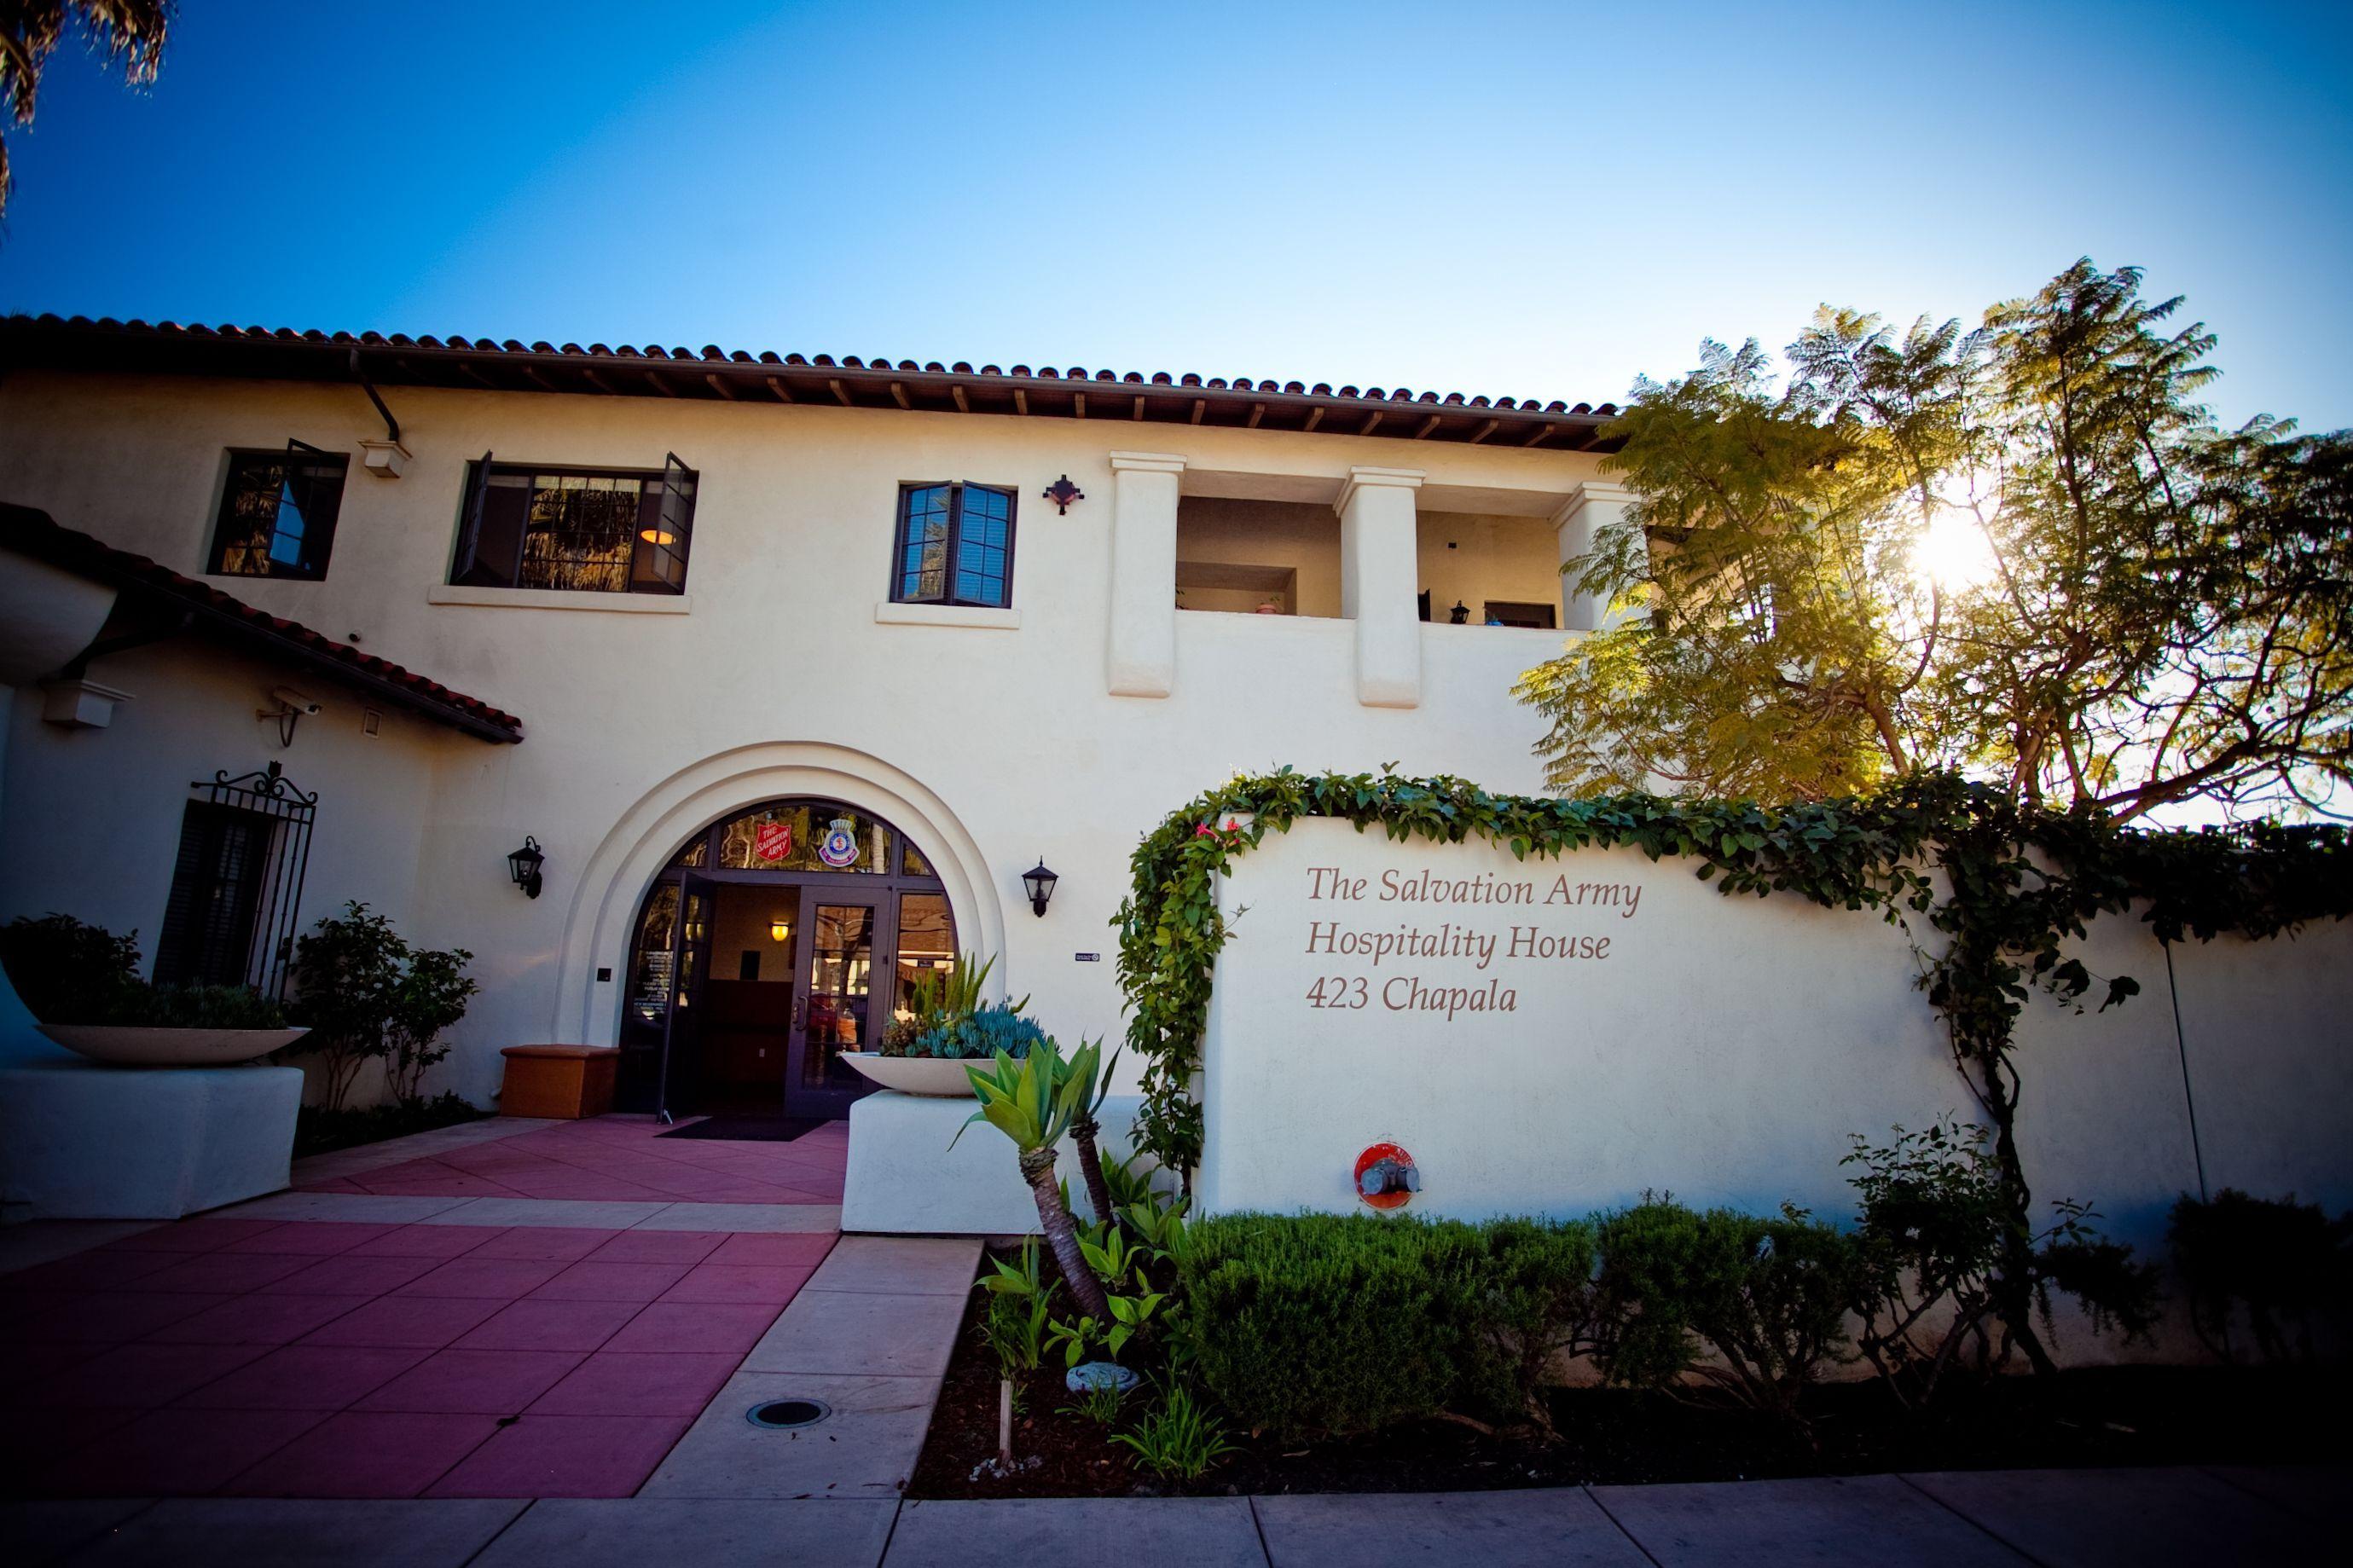 Santa Barbara Hospitality House - Salvation Army